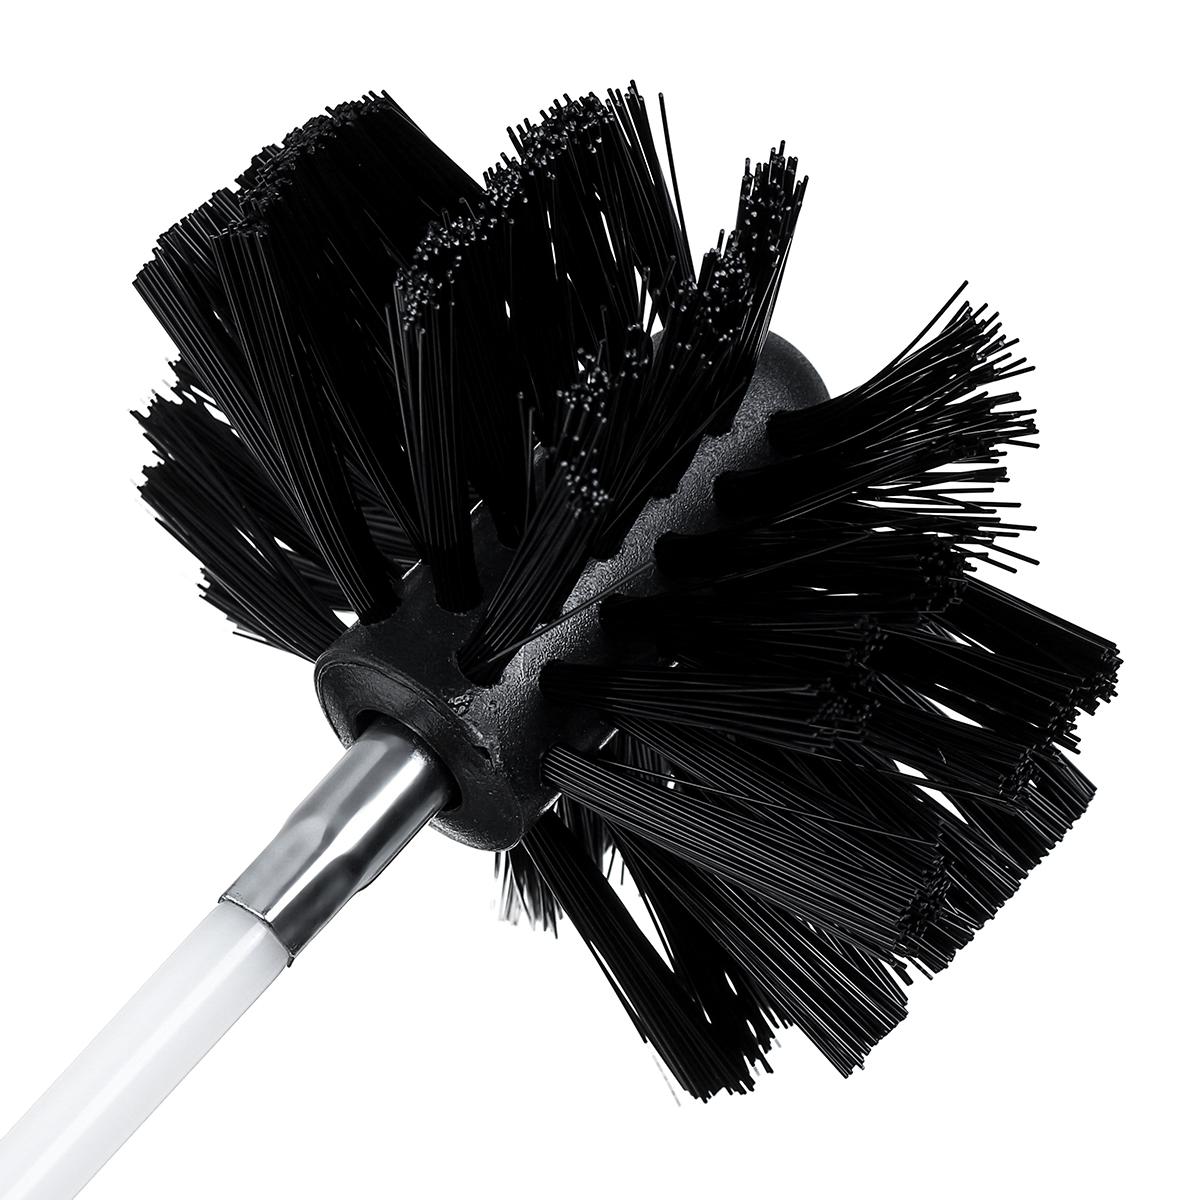 Chimney-Cleaning-Brush-Chimney-Pipe-Inner-Wall-Cleaner-Brush-Bendable thumbnail 5